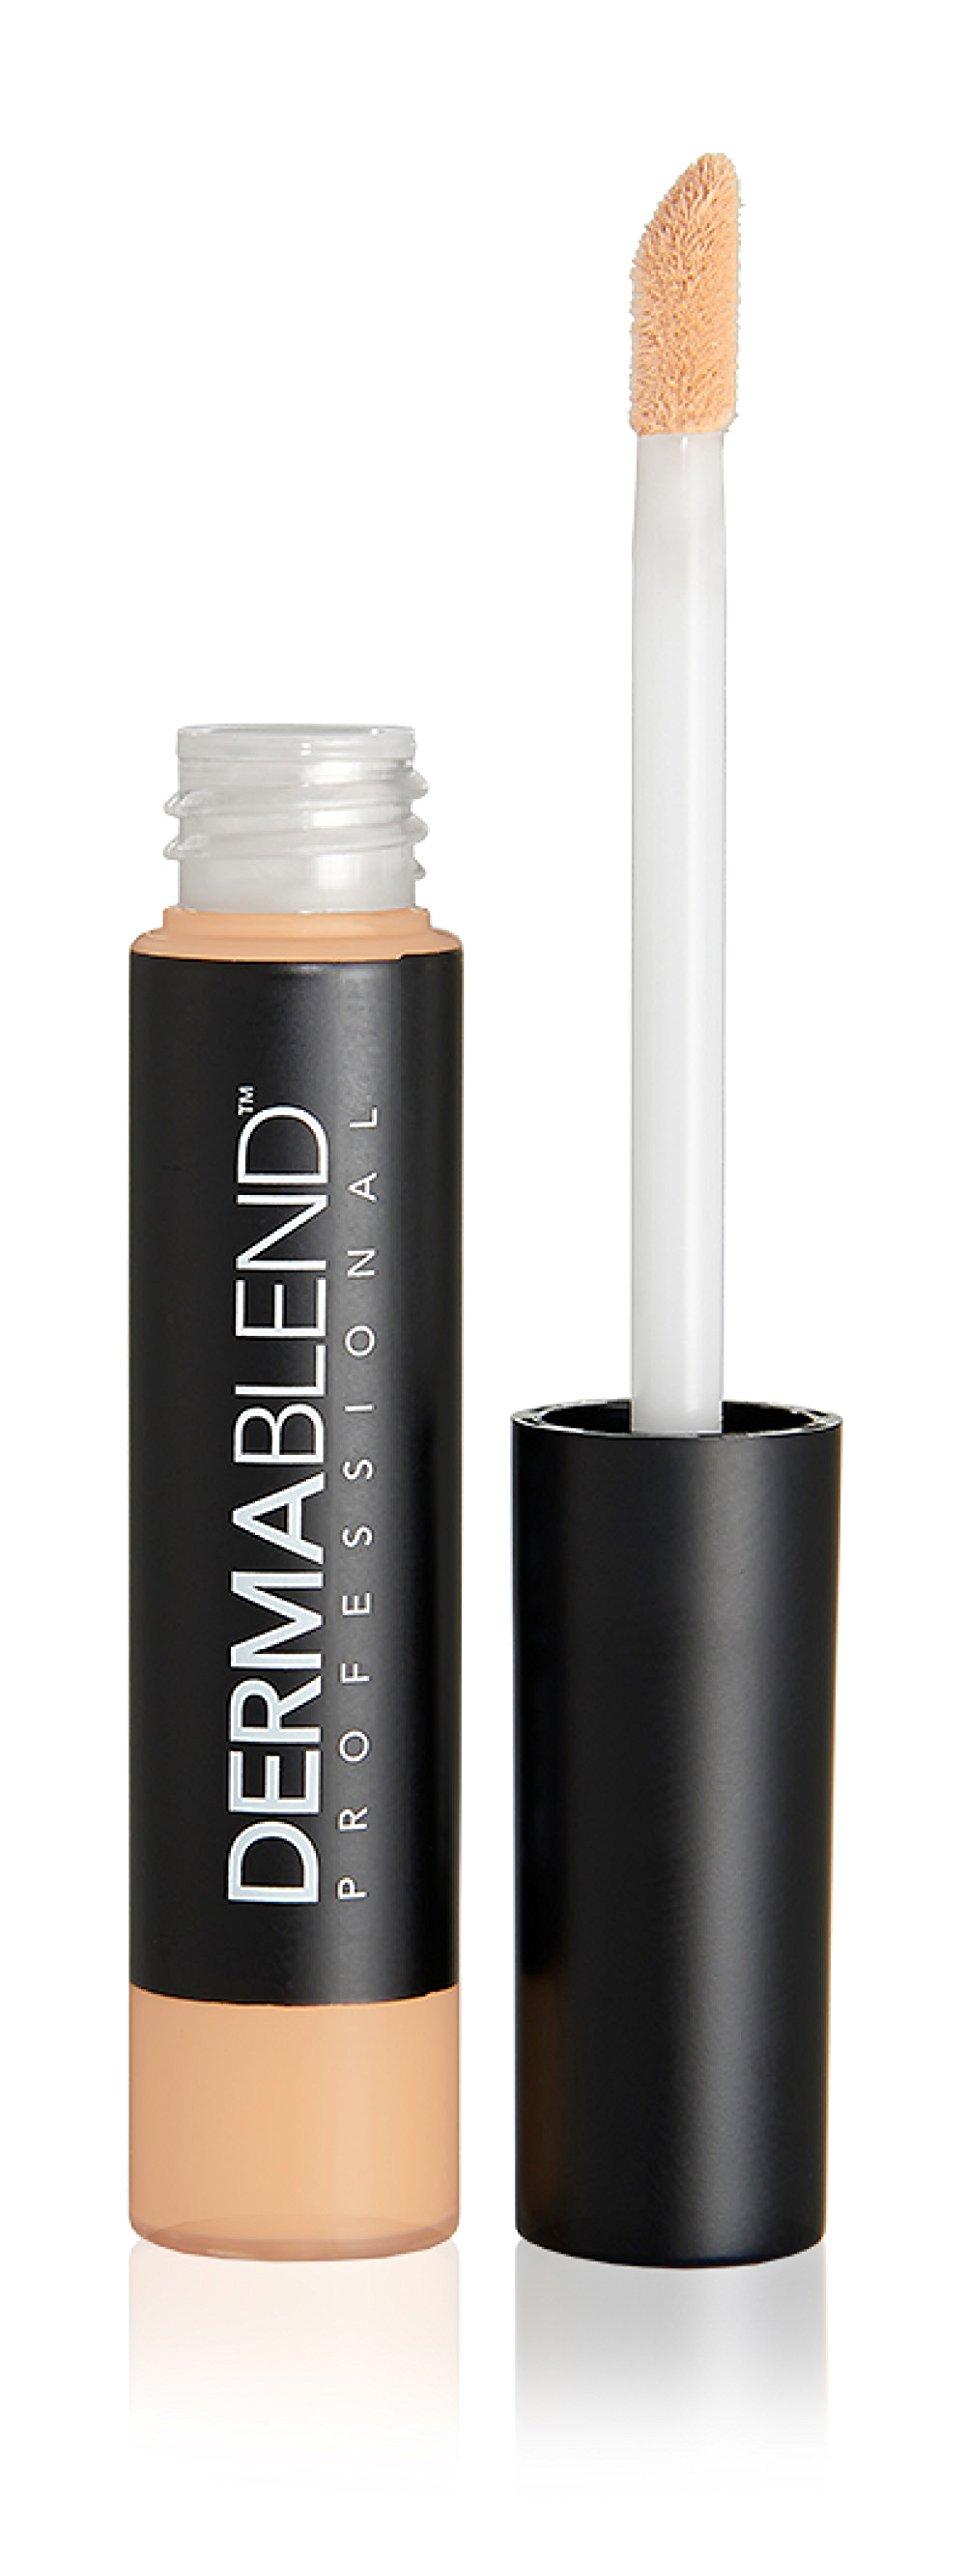 Dermablend Smooth Liquid Concealer, Fair, 0.2 Fl. Oz.